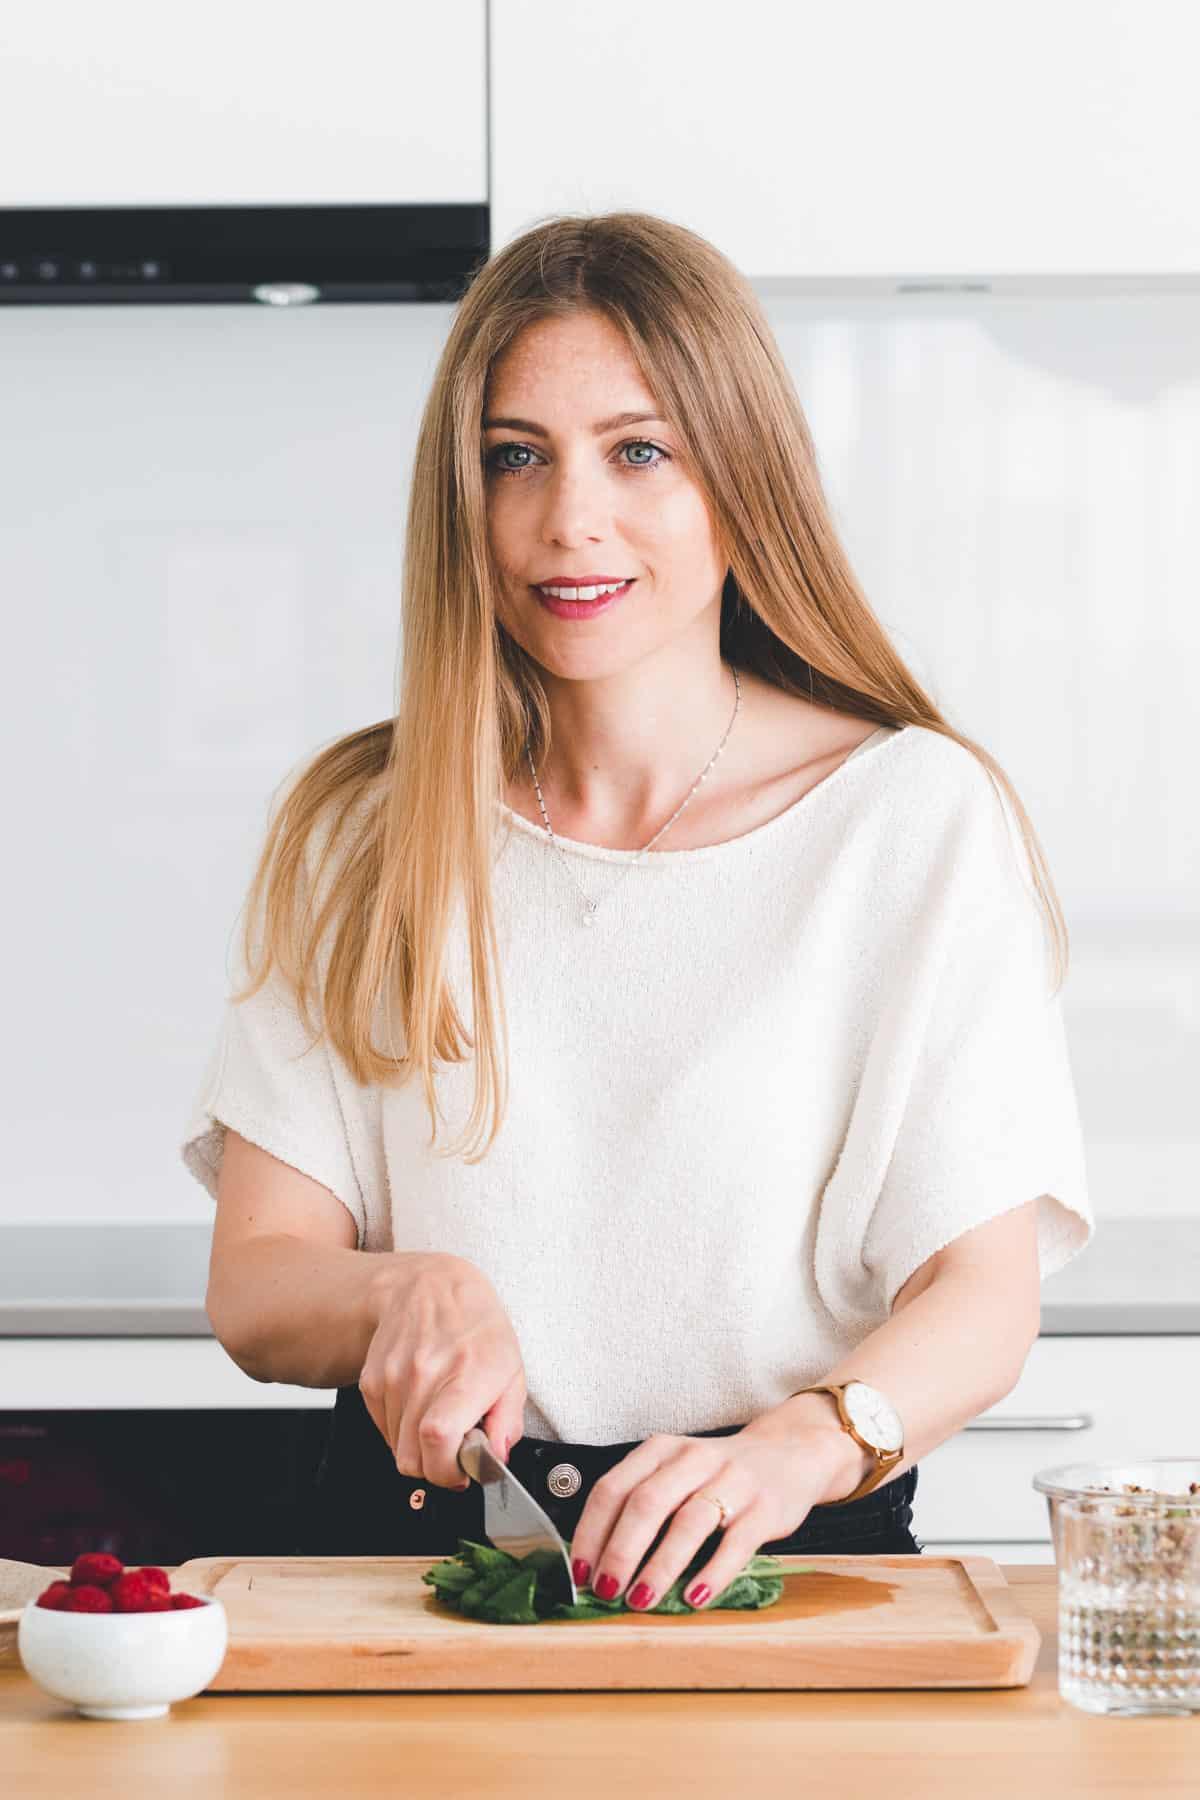 Aline Cueni, Owner & Founder of Aline Made